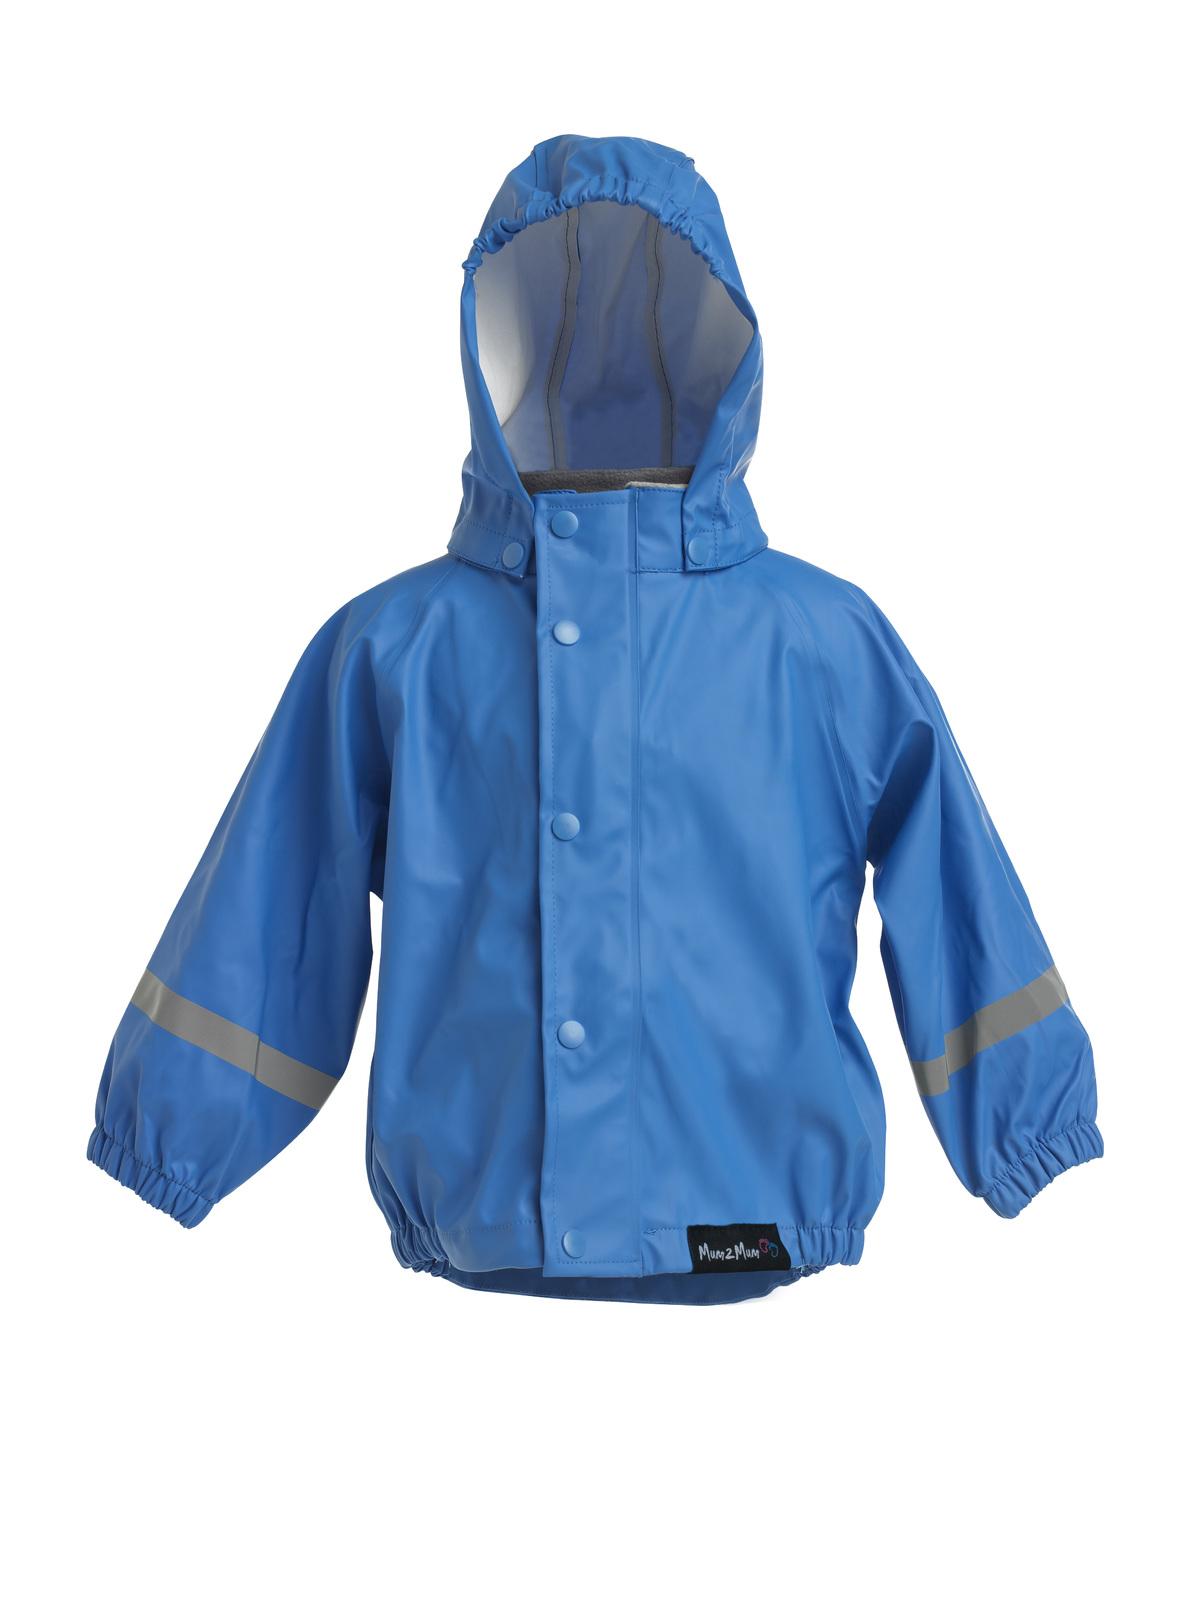 Mum 2 Mum Rainwear Jacket - Royal Blue (12 months) image